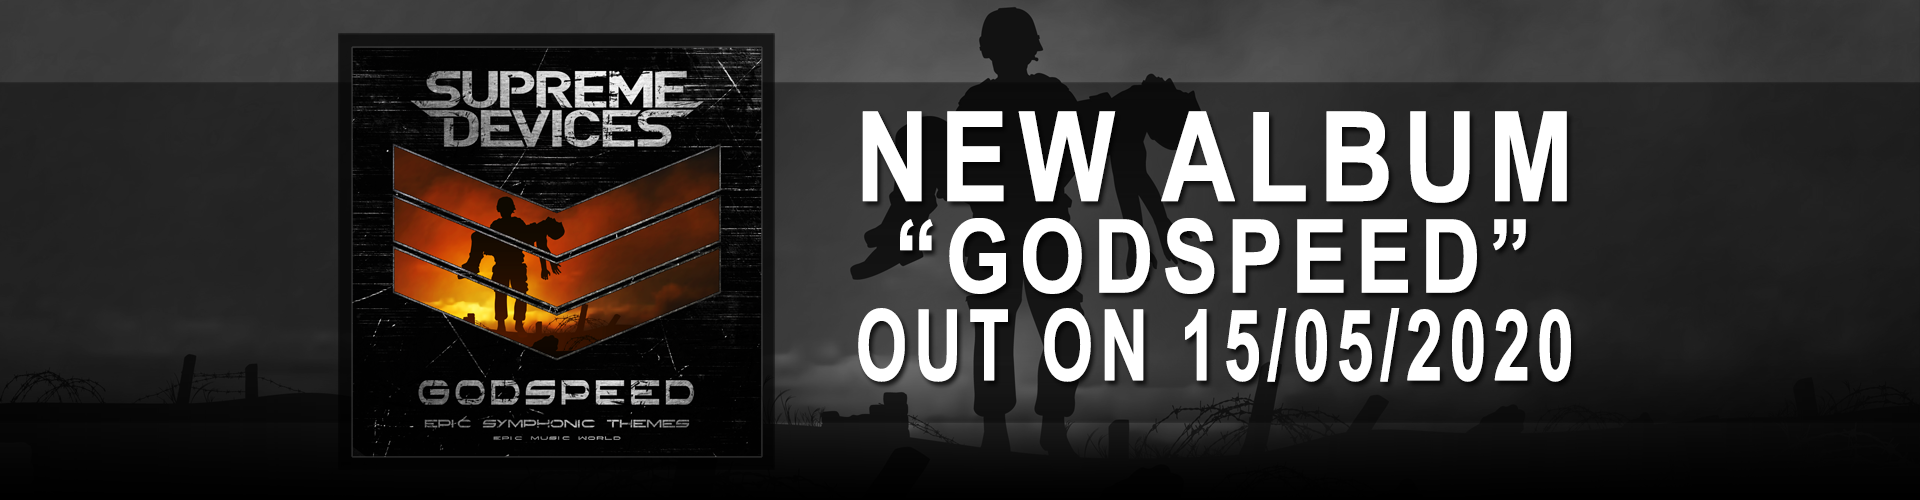 AA uj weboldal Kepek NEW BIG_Godspeed